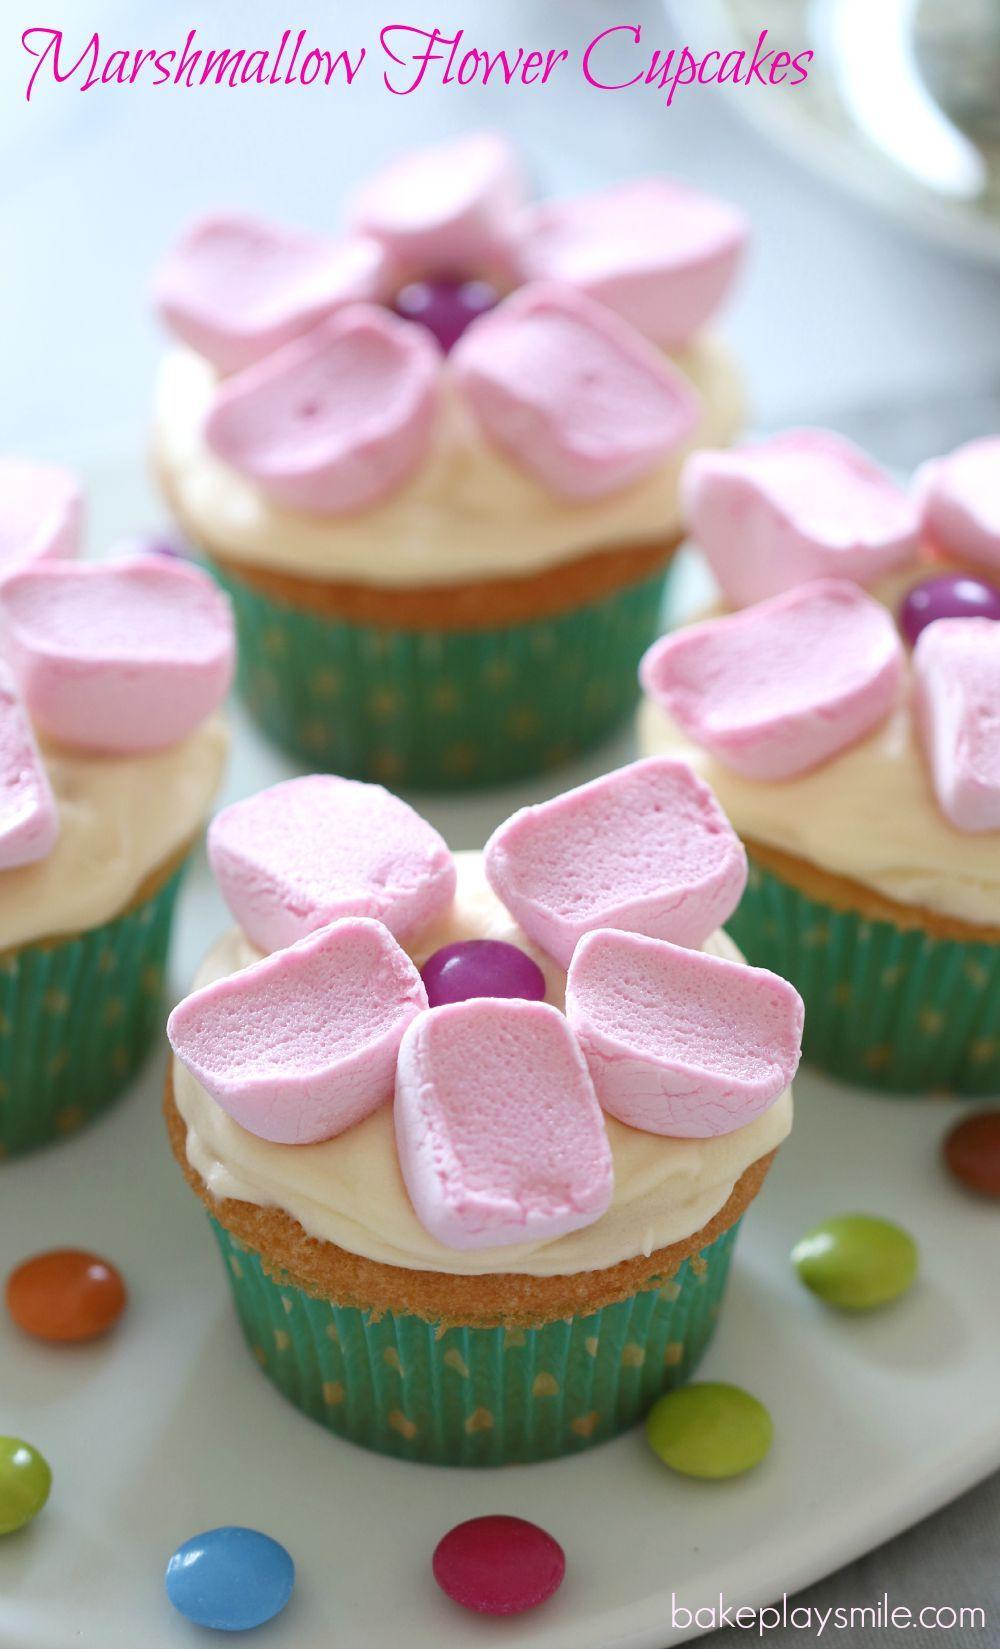 Cute Marshmallow Flower Cupcakes Recipe Smarties recipes